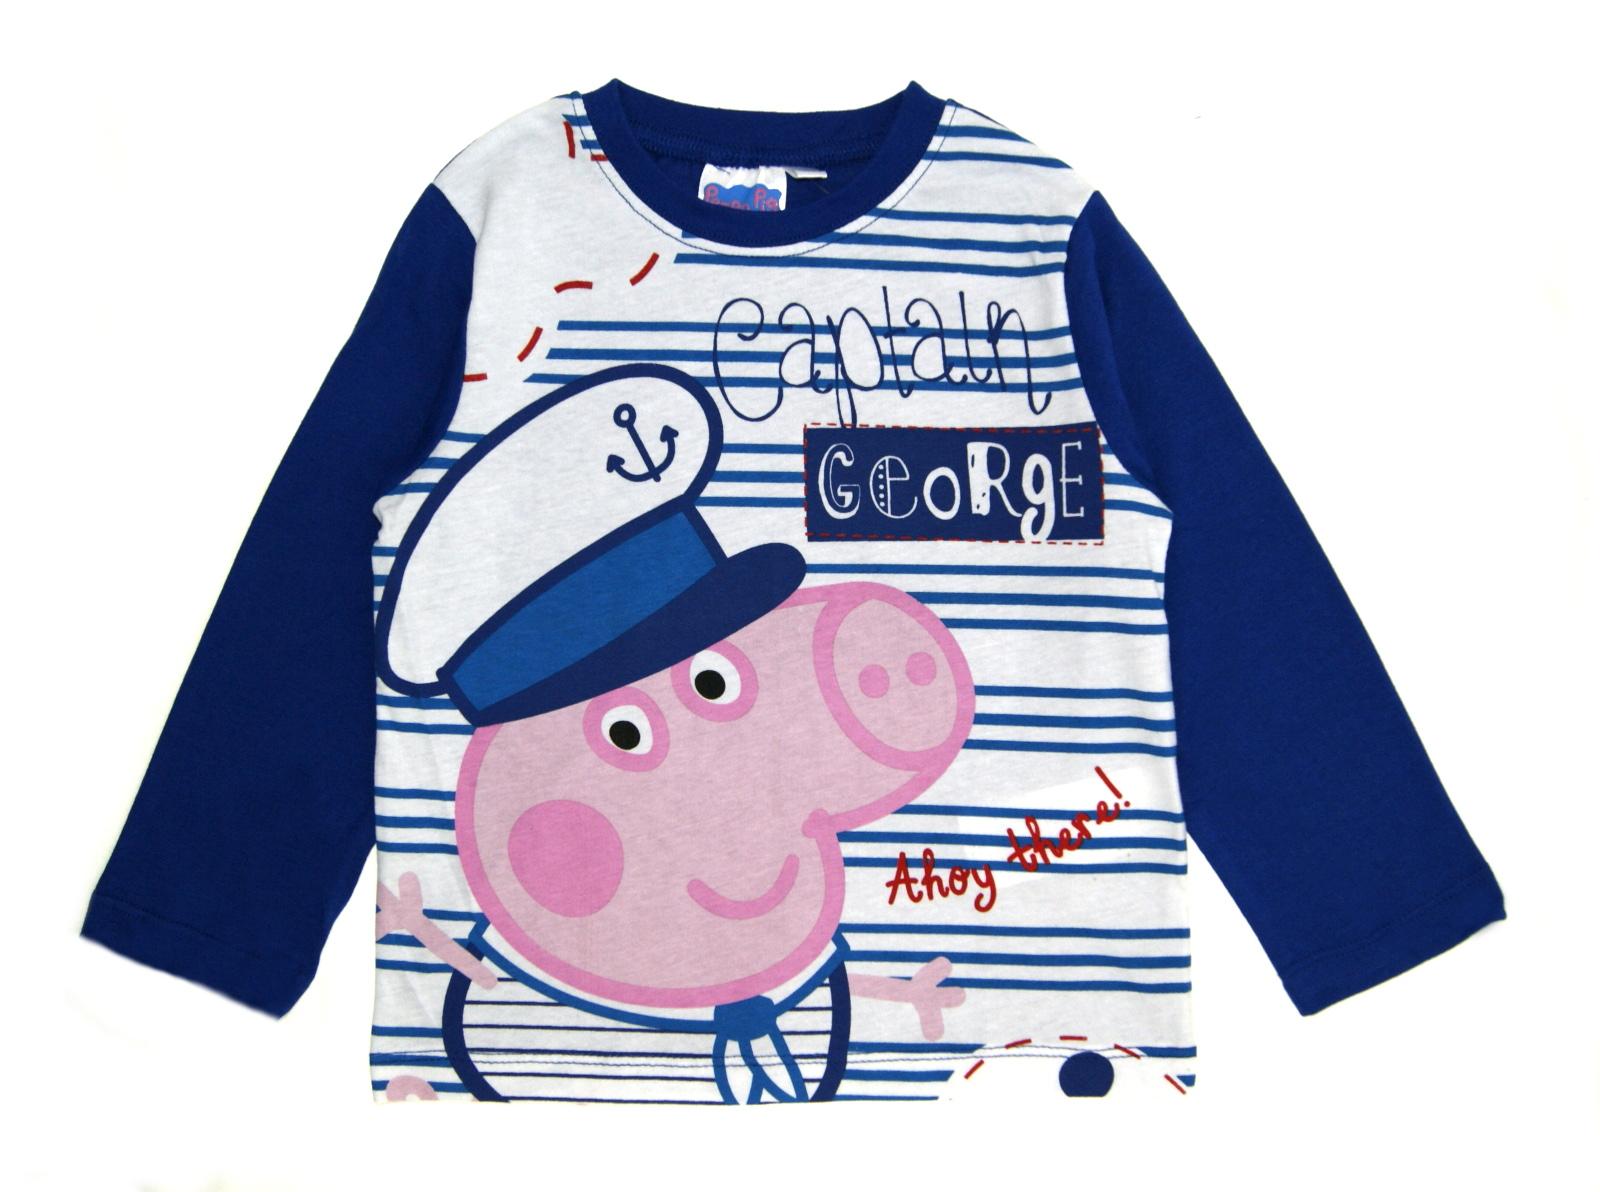 ff870fc839 Boys Peppa Pig George Pyjamas 100% Cotton Full Length Pjs Character ...